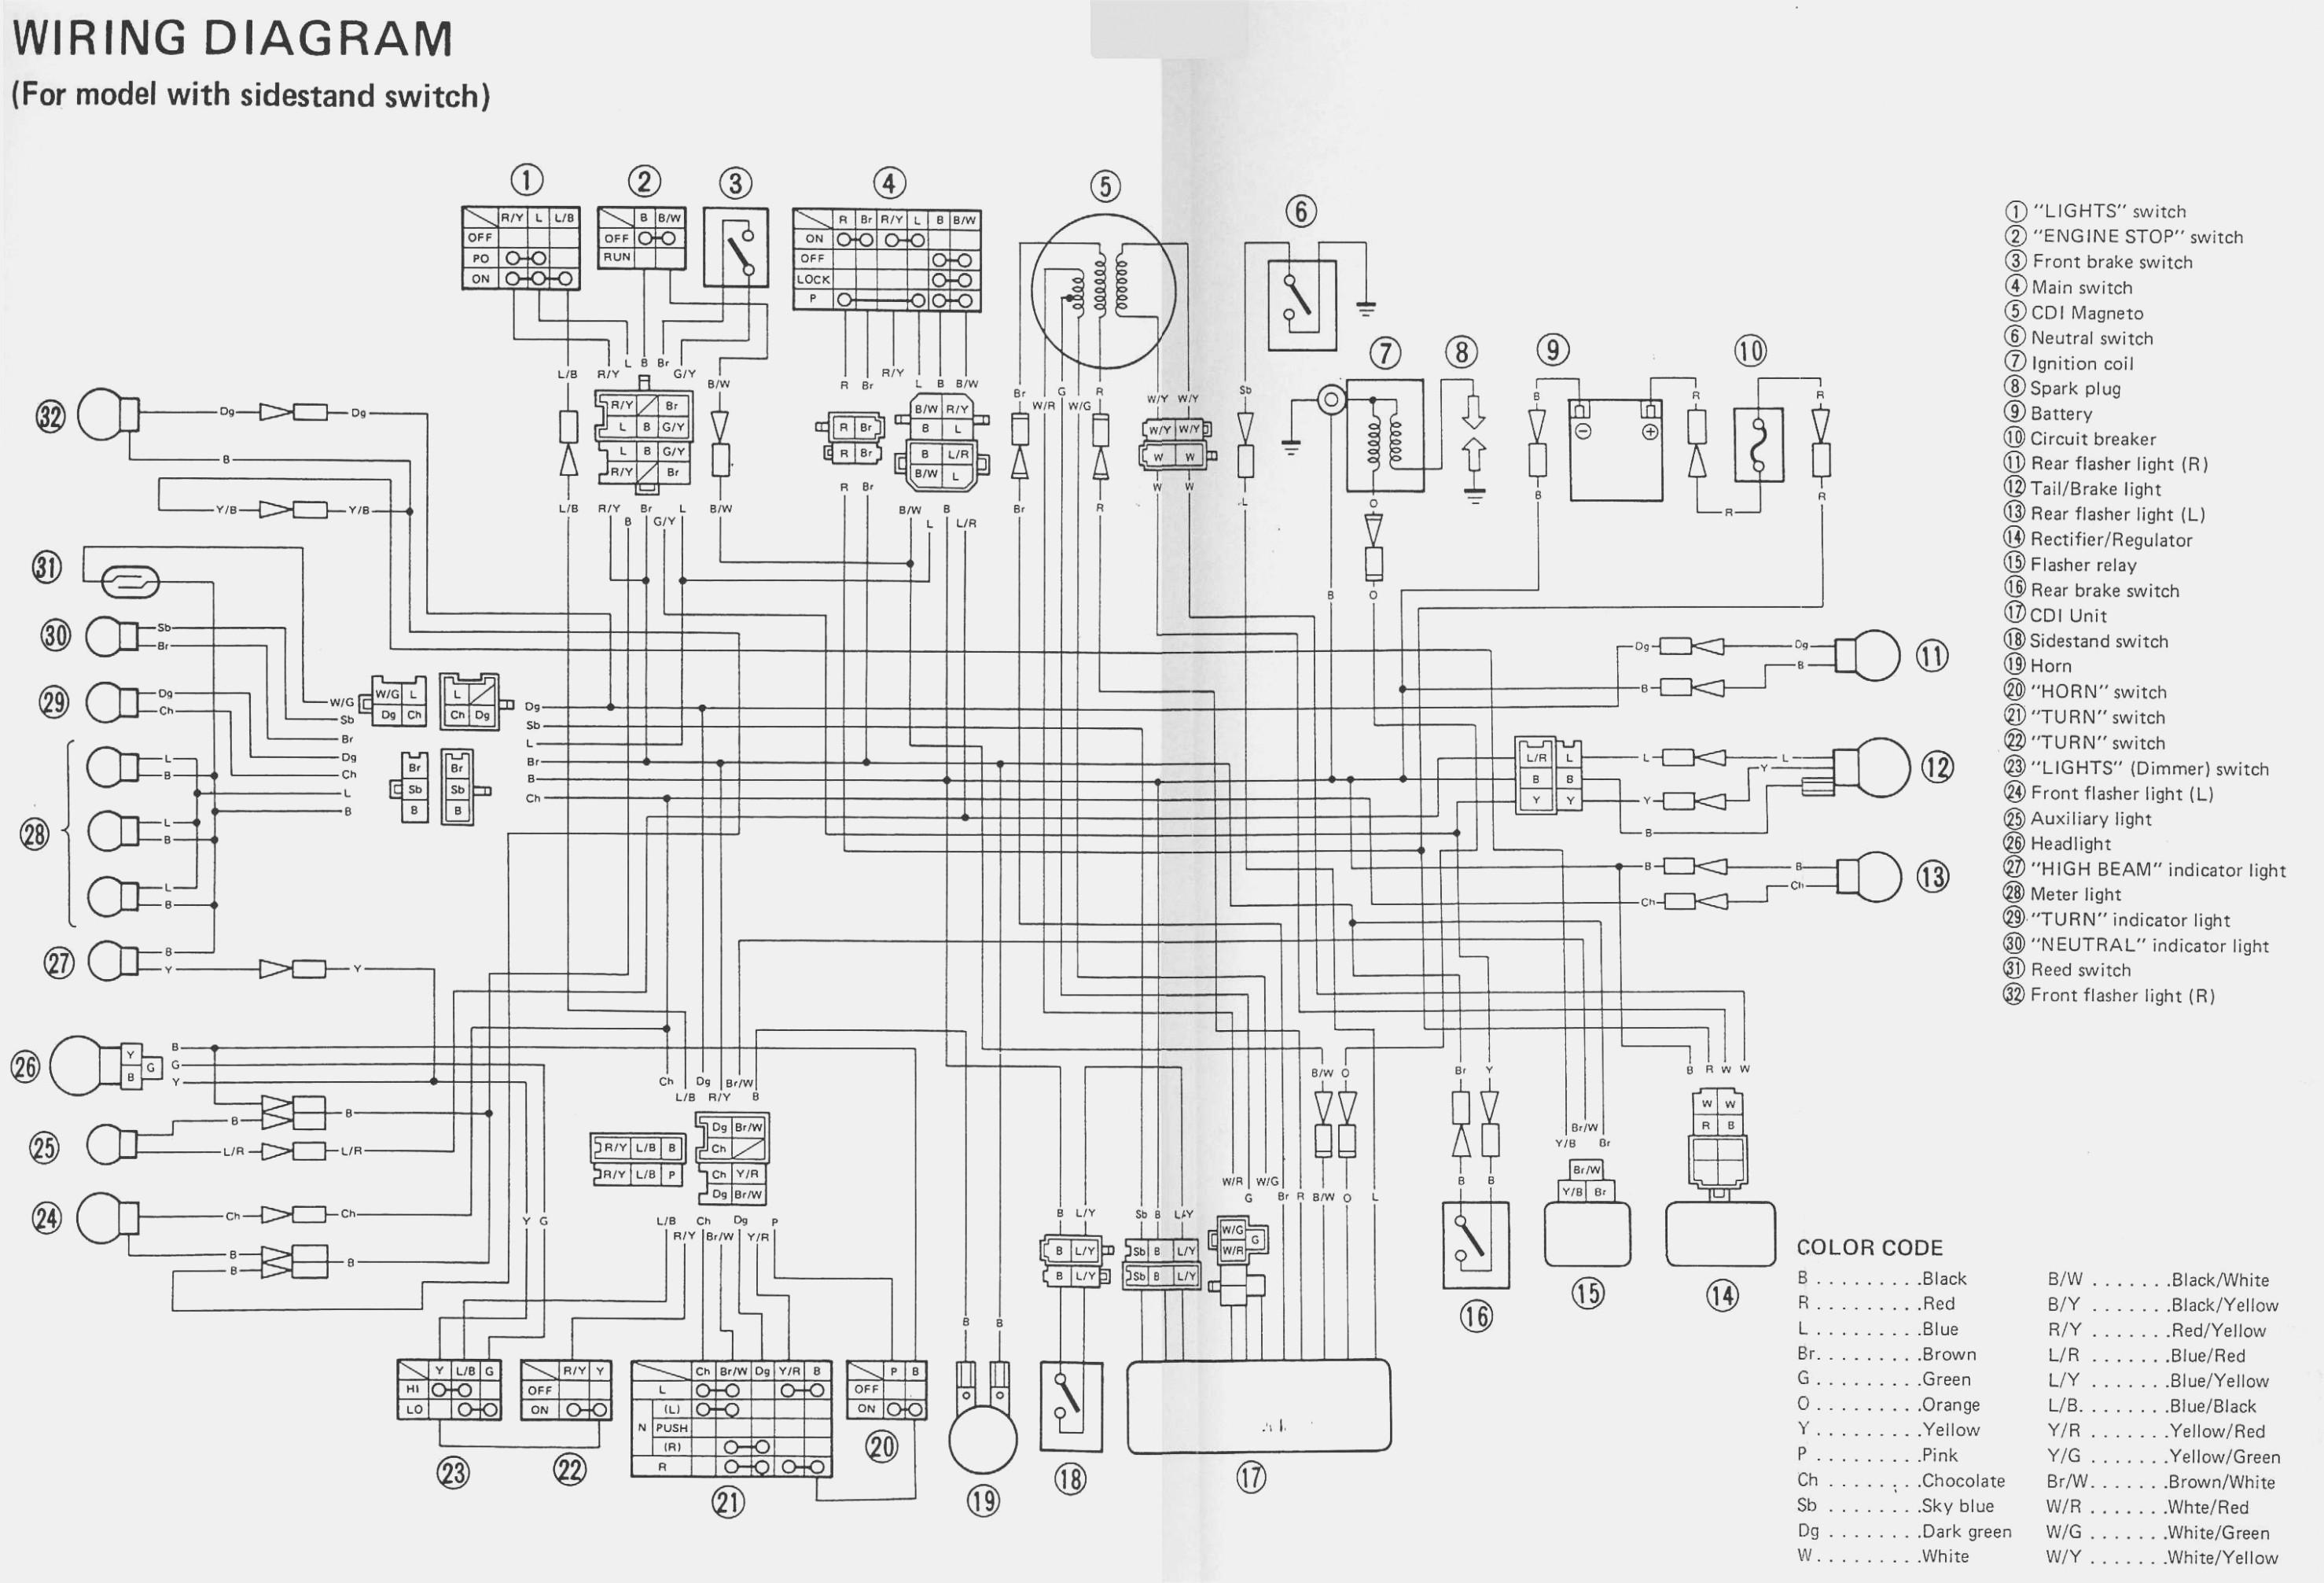 Wiringdiagram Yamaha Big Bear 350 Yc 5002] Yamaha Yfm350 Wiring Diagram Free Diagram Of Wiringdiagram Yamaha Big Bear 350